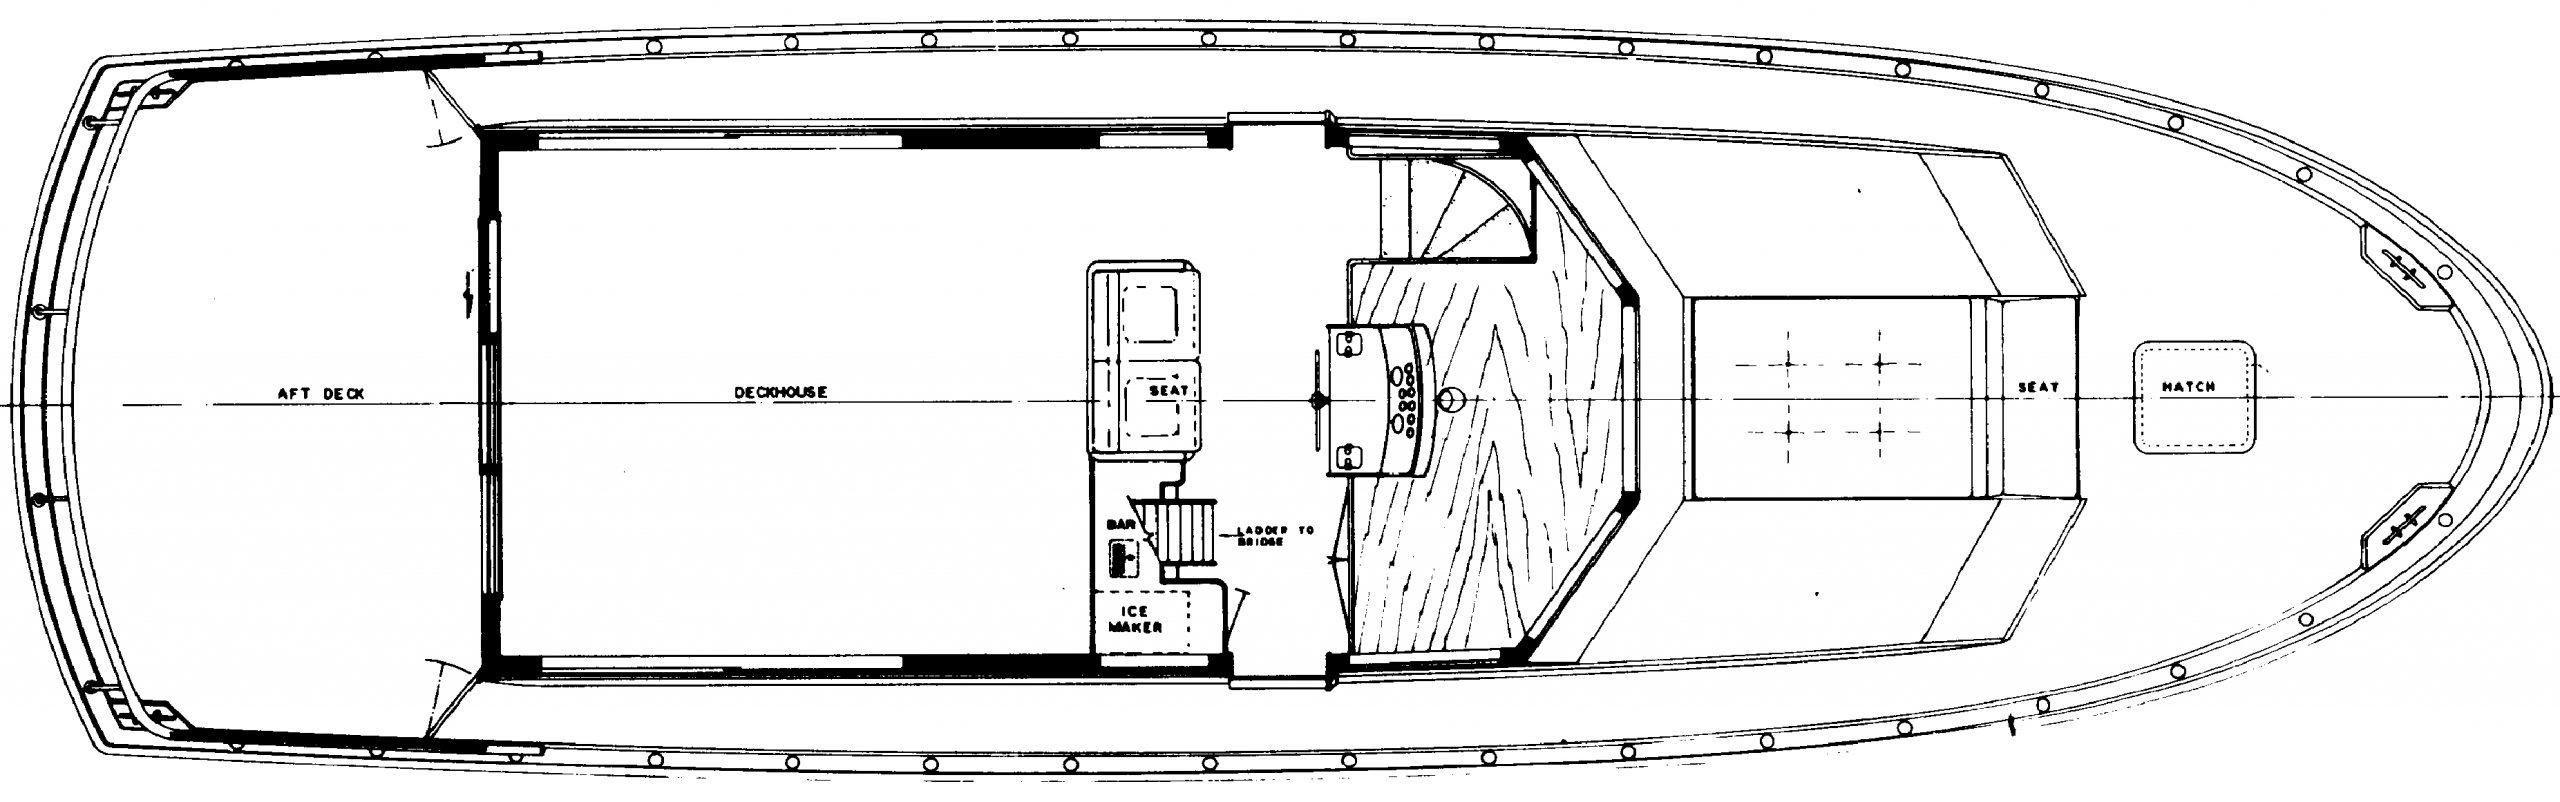 54 Motor Yacht Floor Plan 2